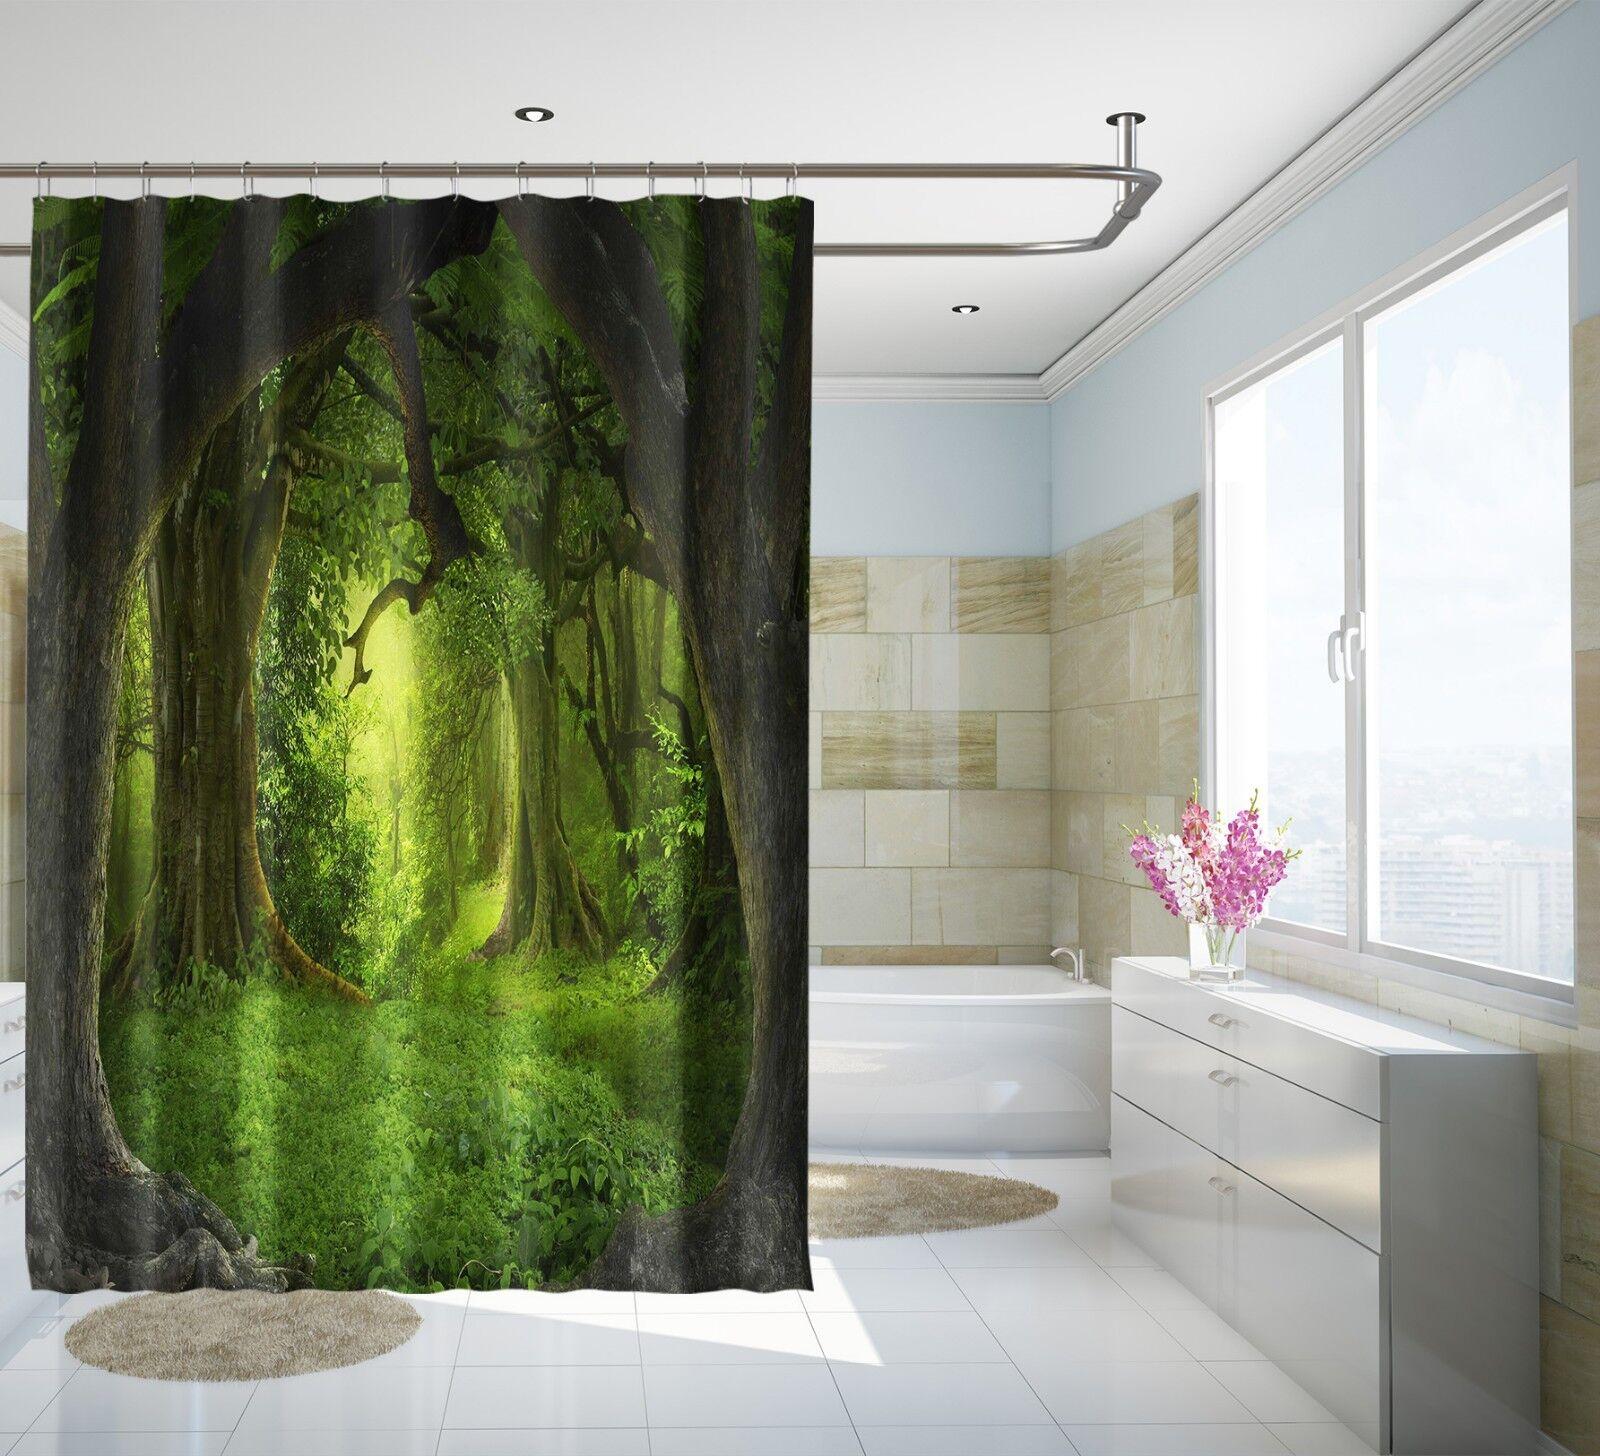 3D Wiese Wiese Wiese Baum 68 Duschvorhang Wasserdichte Faser Bad Daheim Windows Toilette DE   Trendy  70fa0e